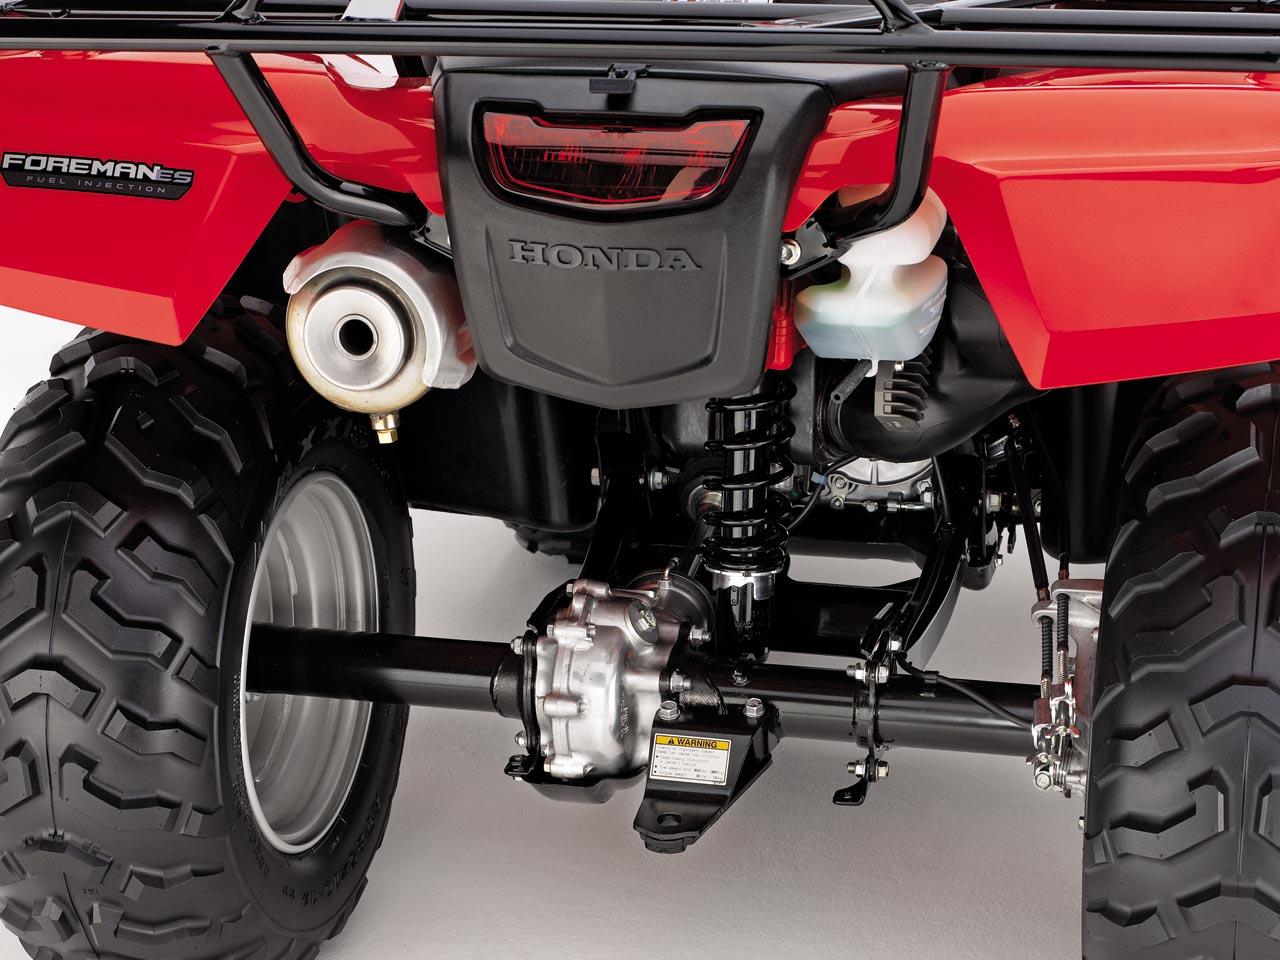 2012.honda_.fourtrax-foreman.close-up.rear-suspension.